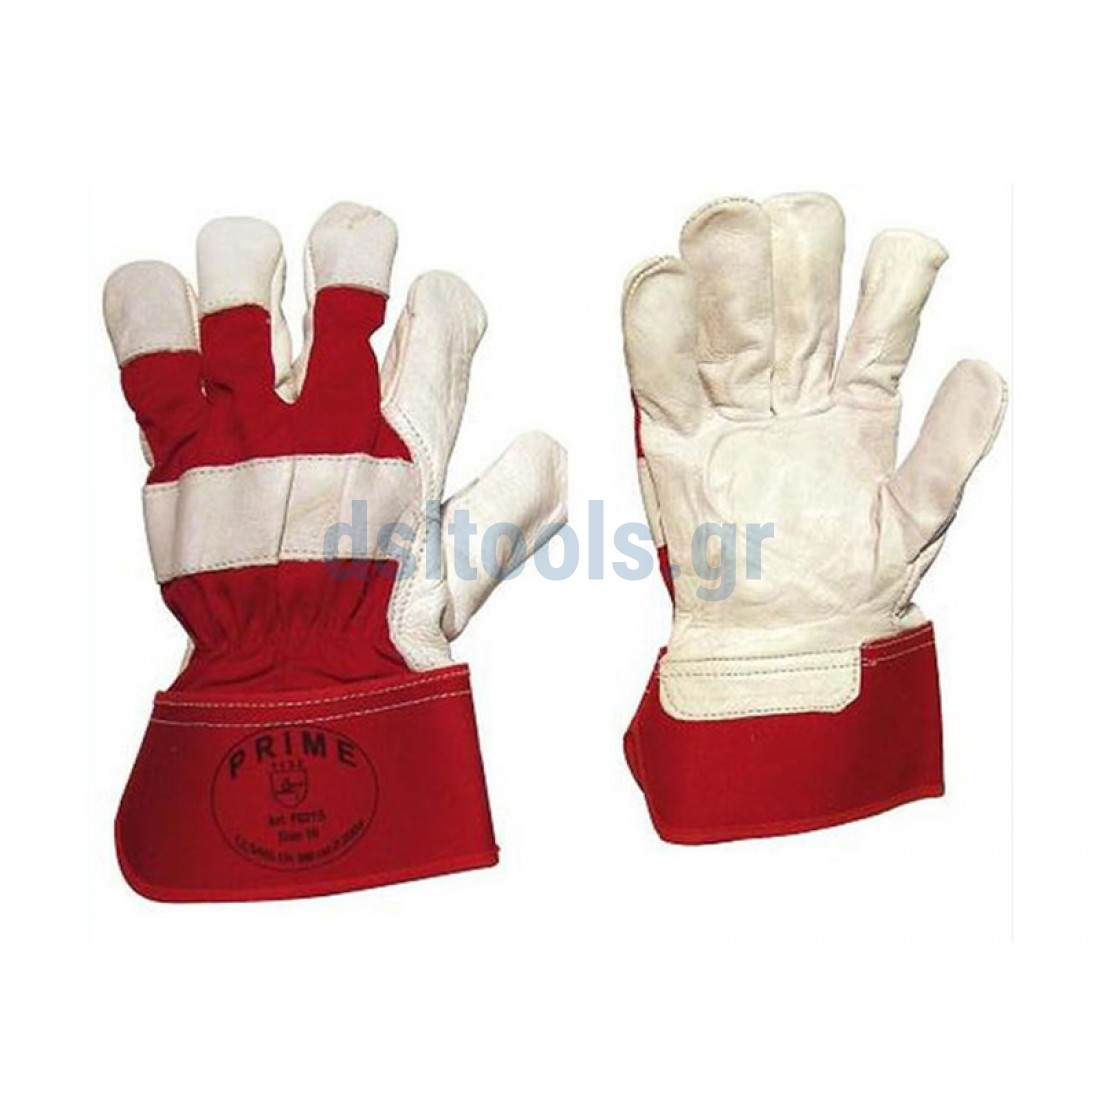 495e844bb4 Γάντια δερμάτινα μόσχου Λευκό-Κόκκινο